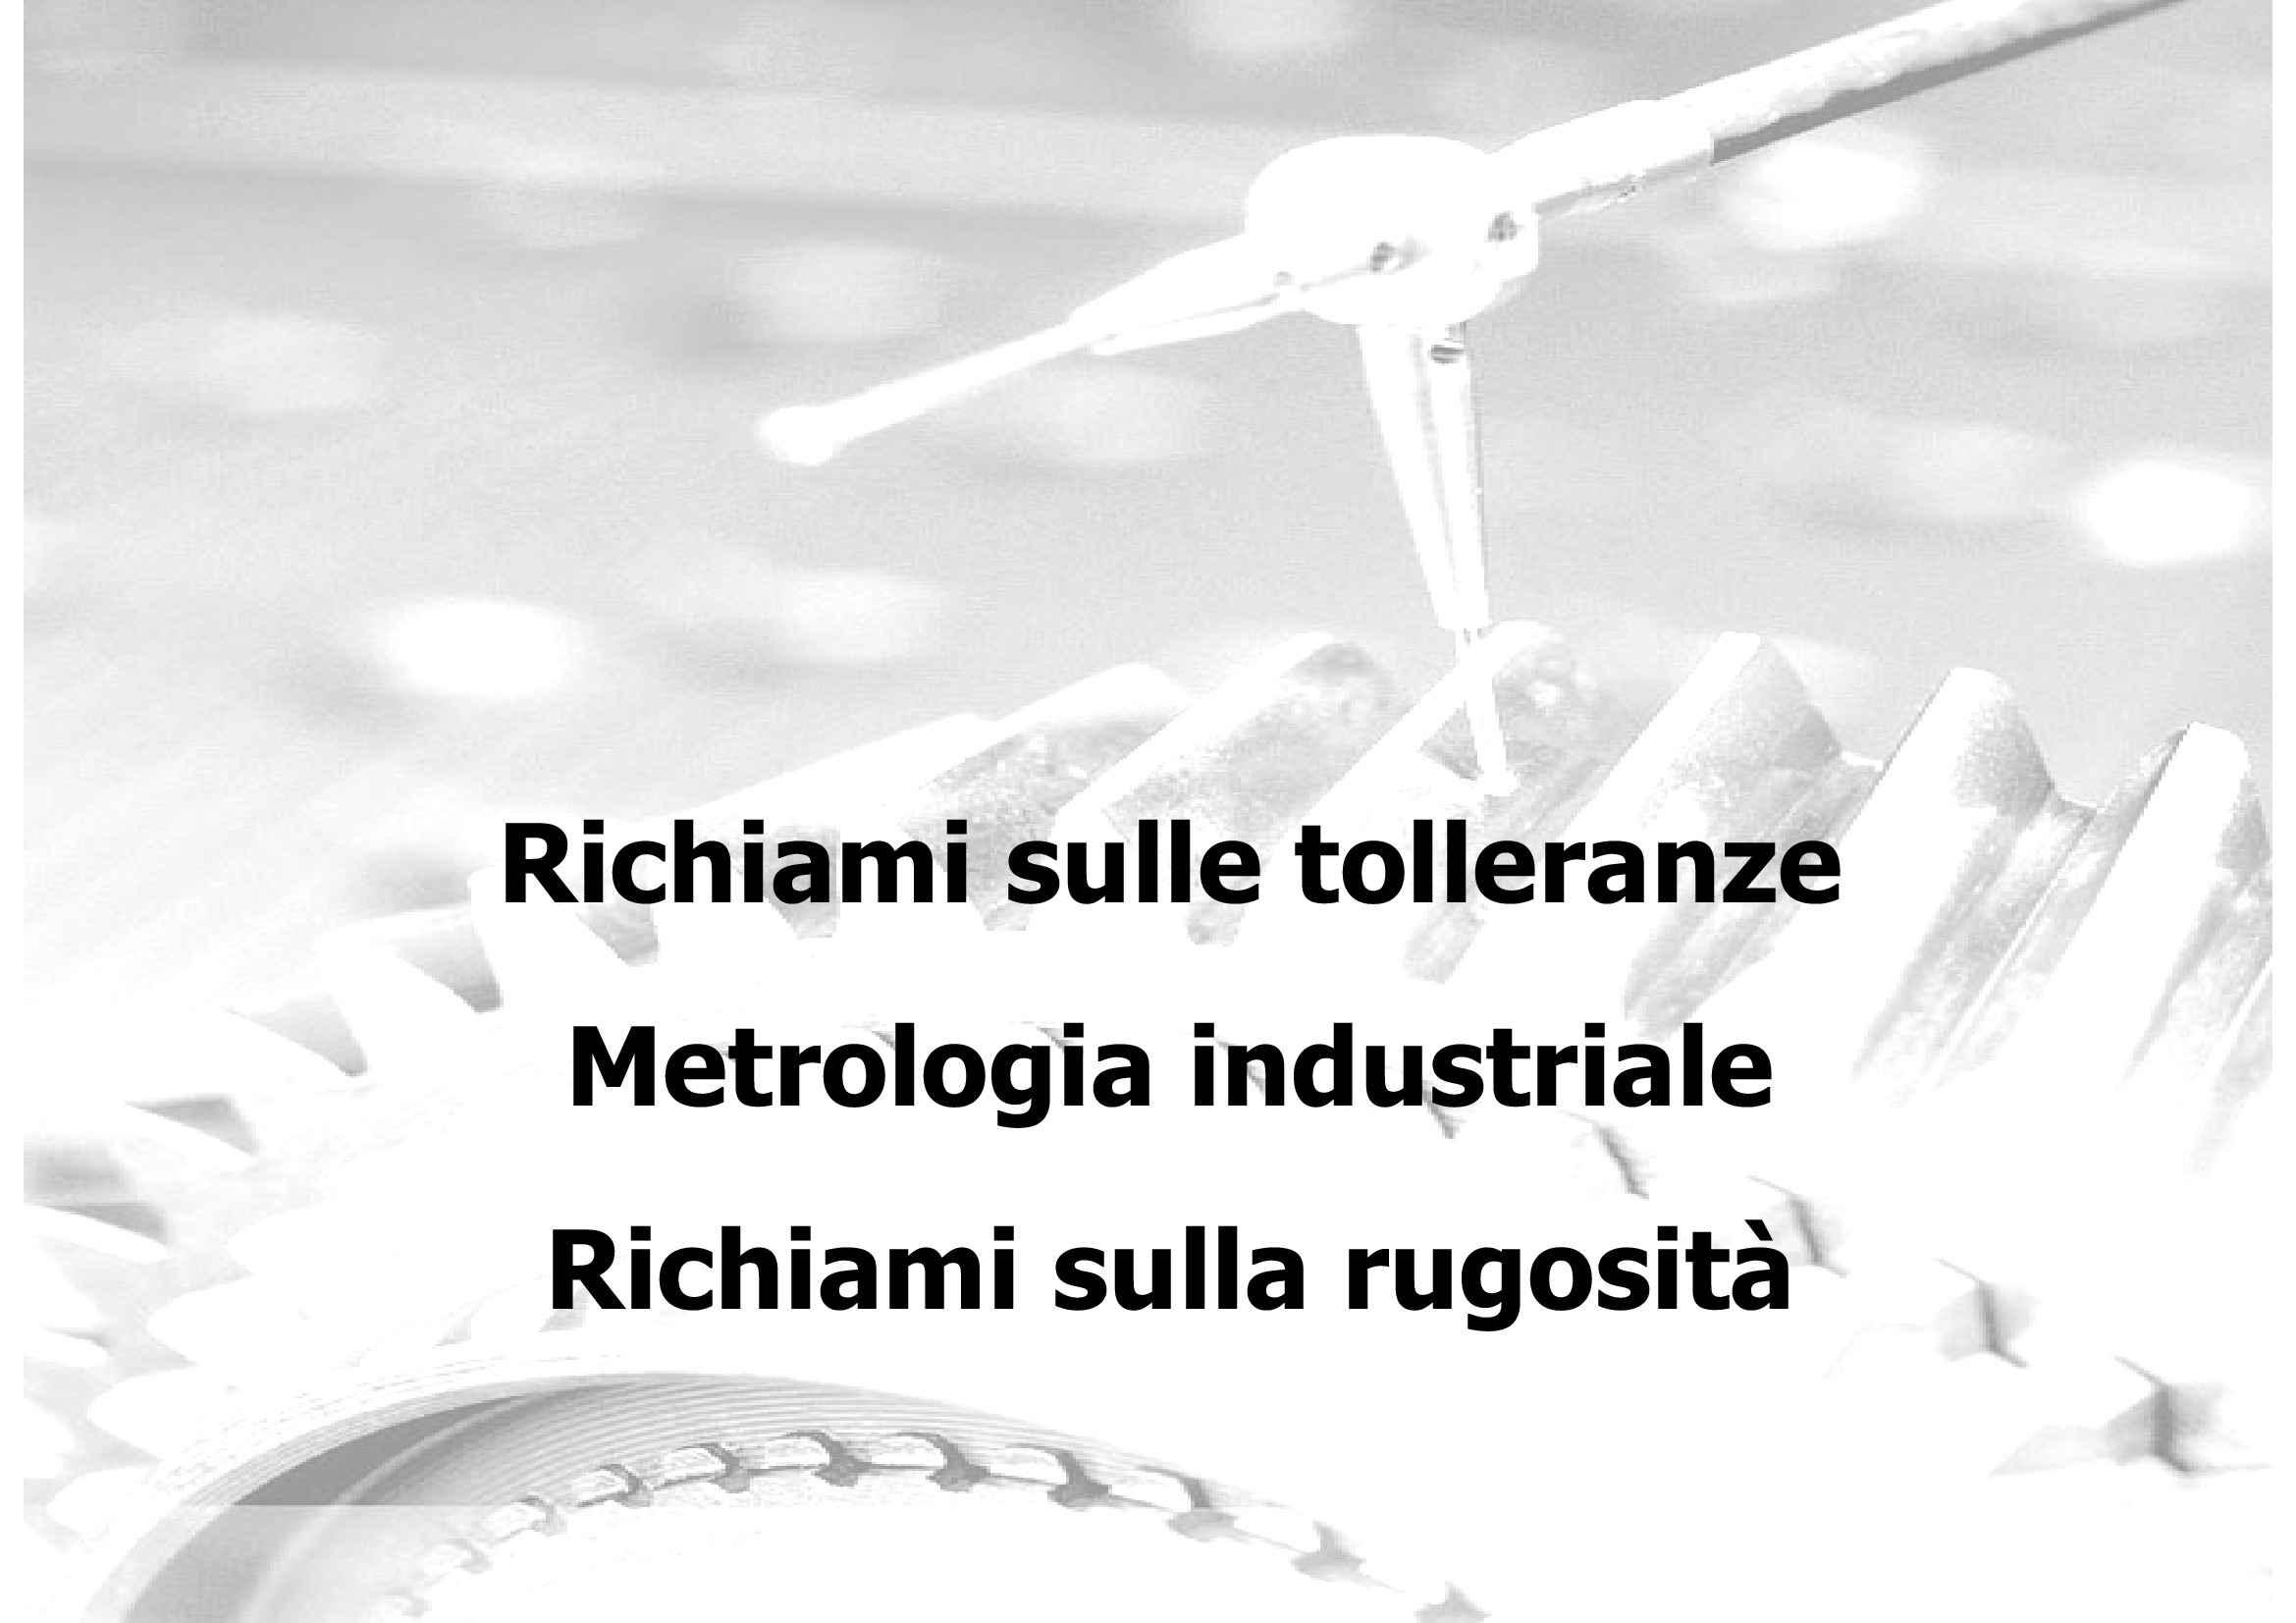 Metrologia industriale